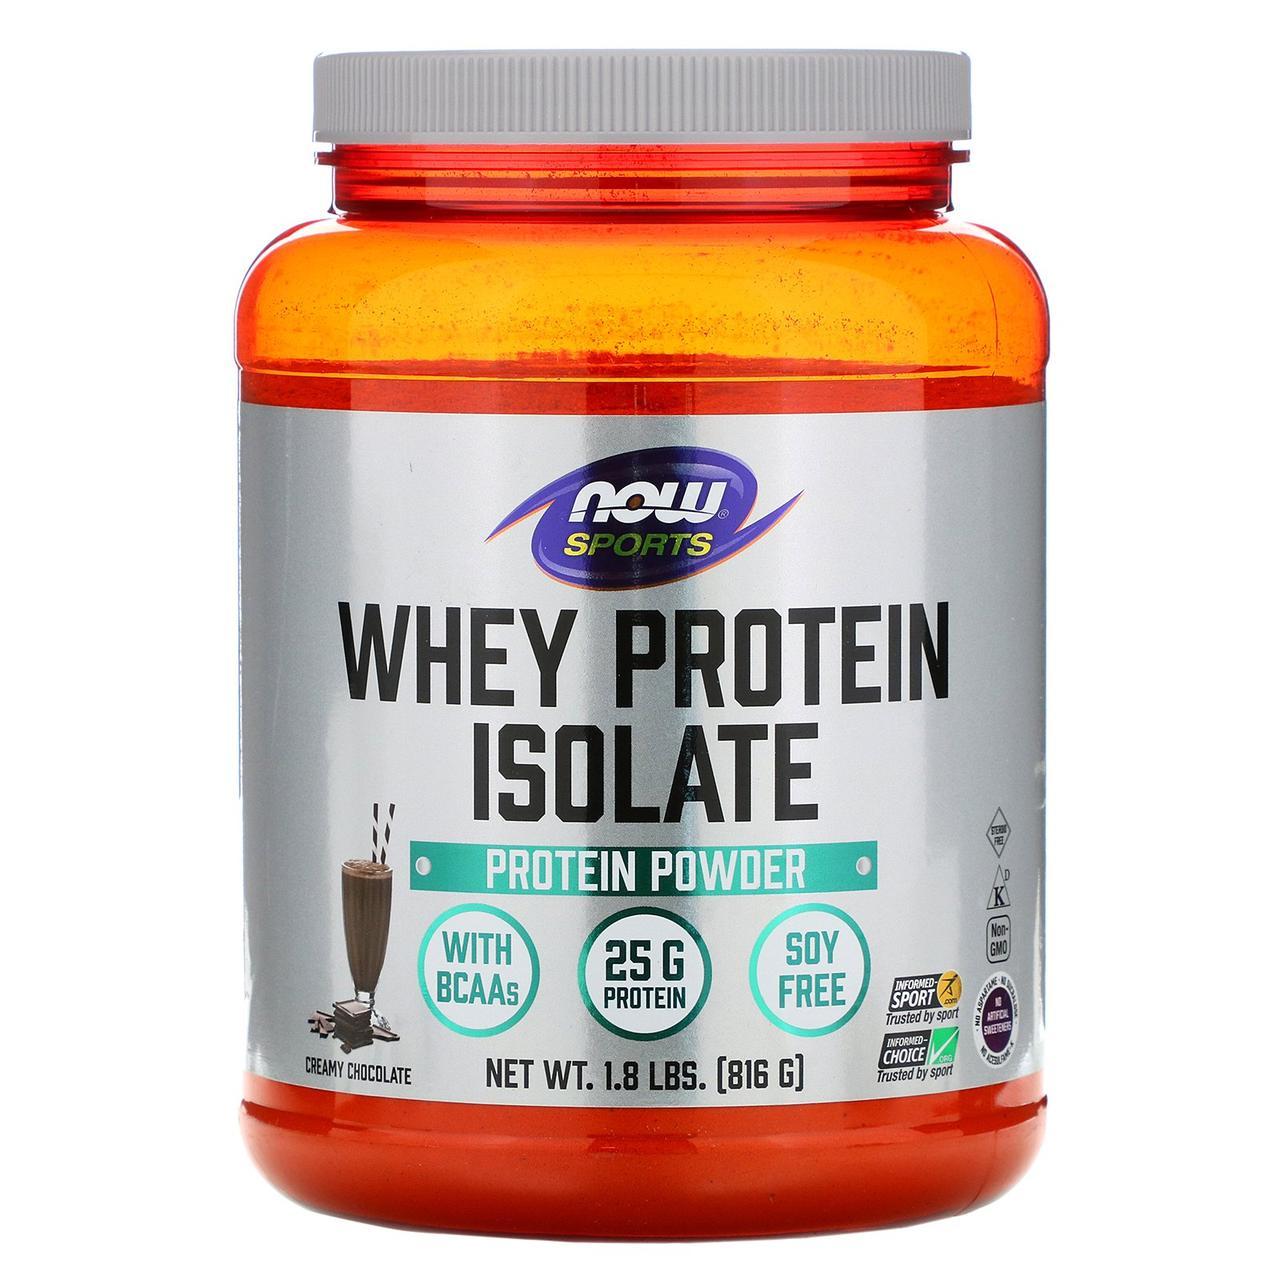 Сывороточный протеин изолят, Whey Protein Isolate, Now Foods, 816 г